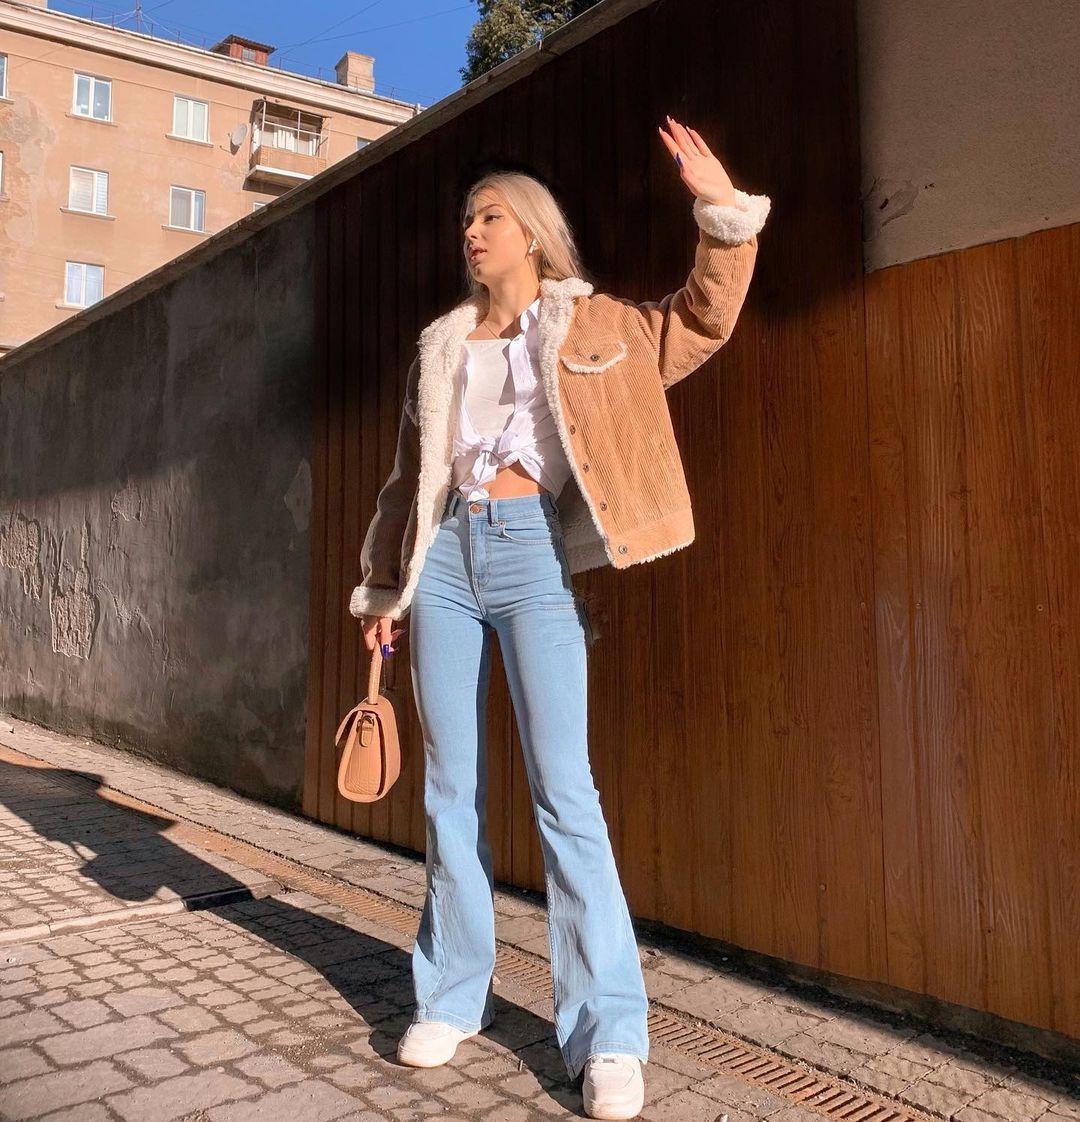 Maria-Holdishuk-Wallpapers-Insta-Fit-Bio-7